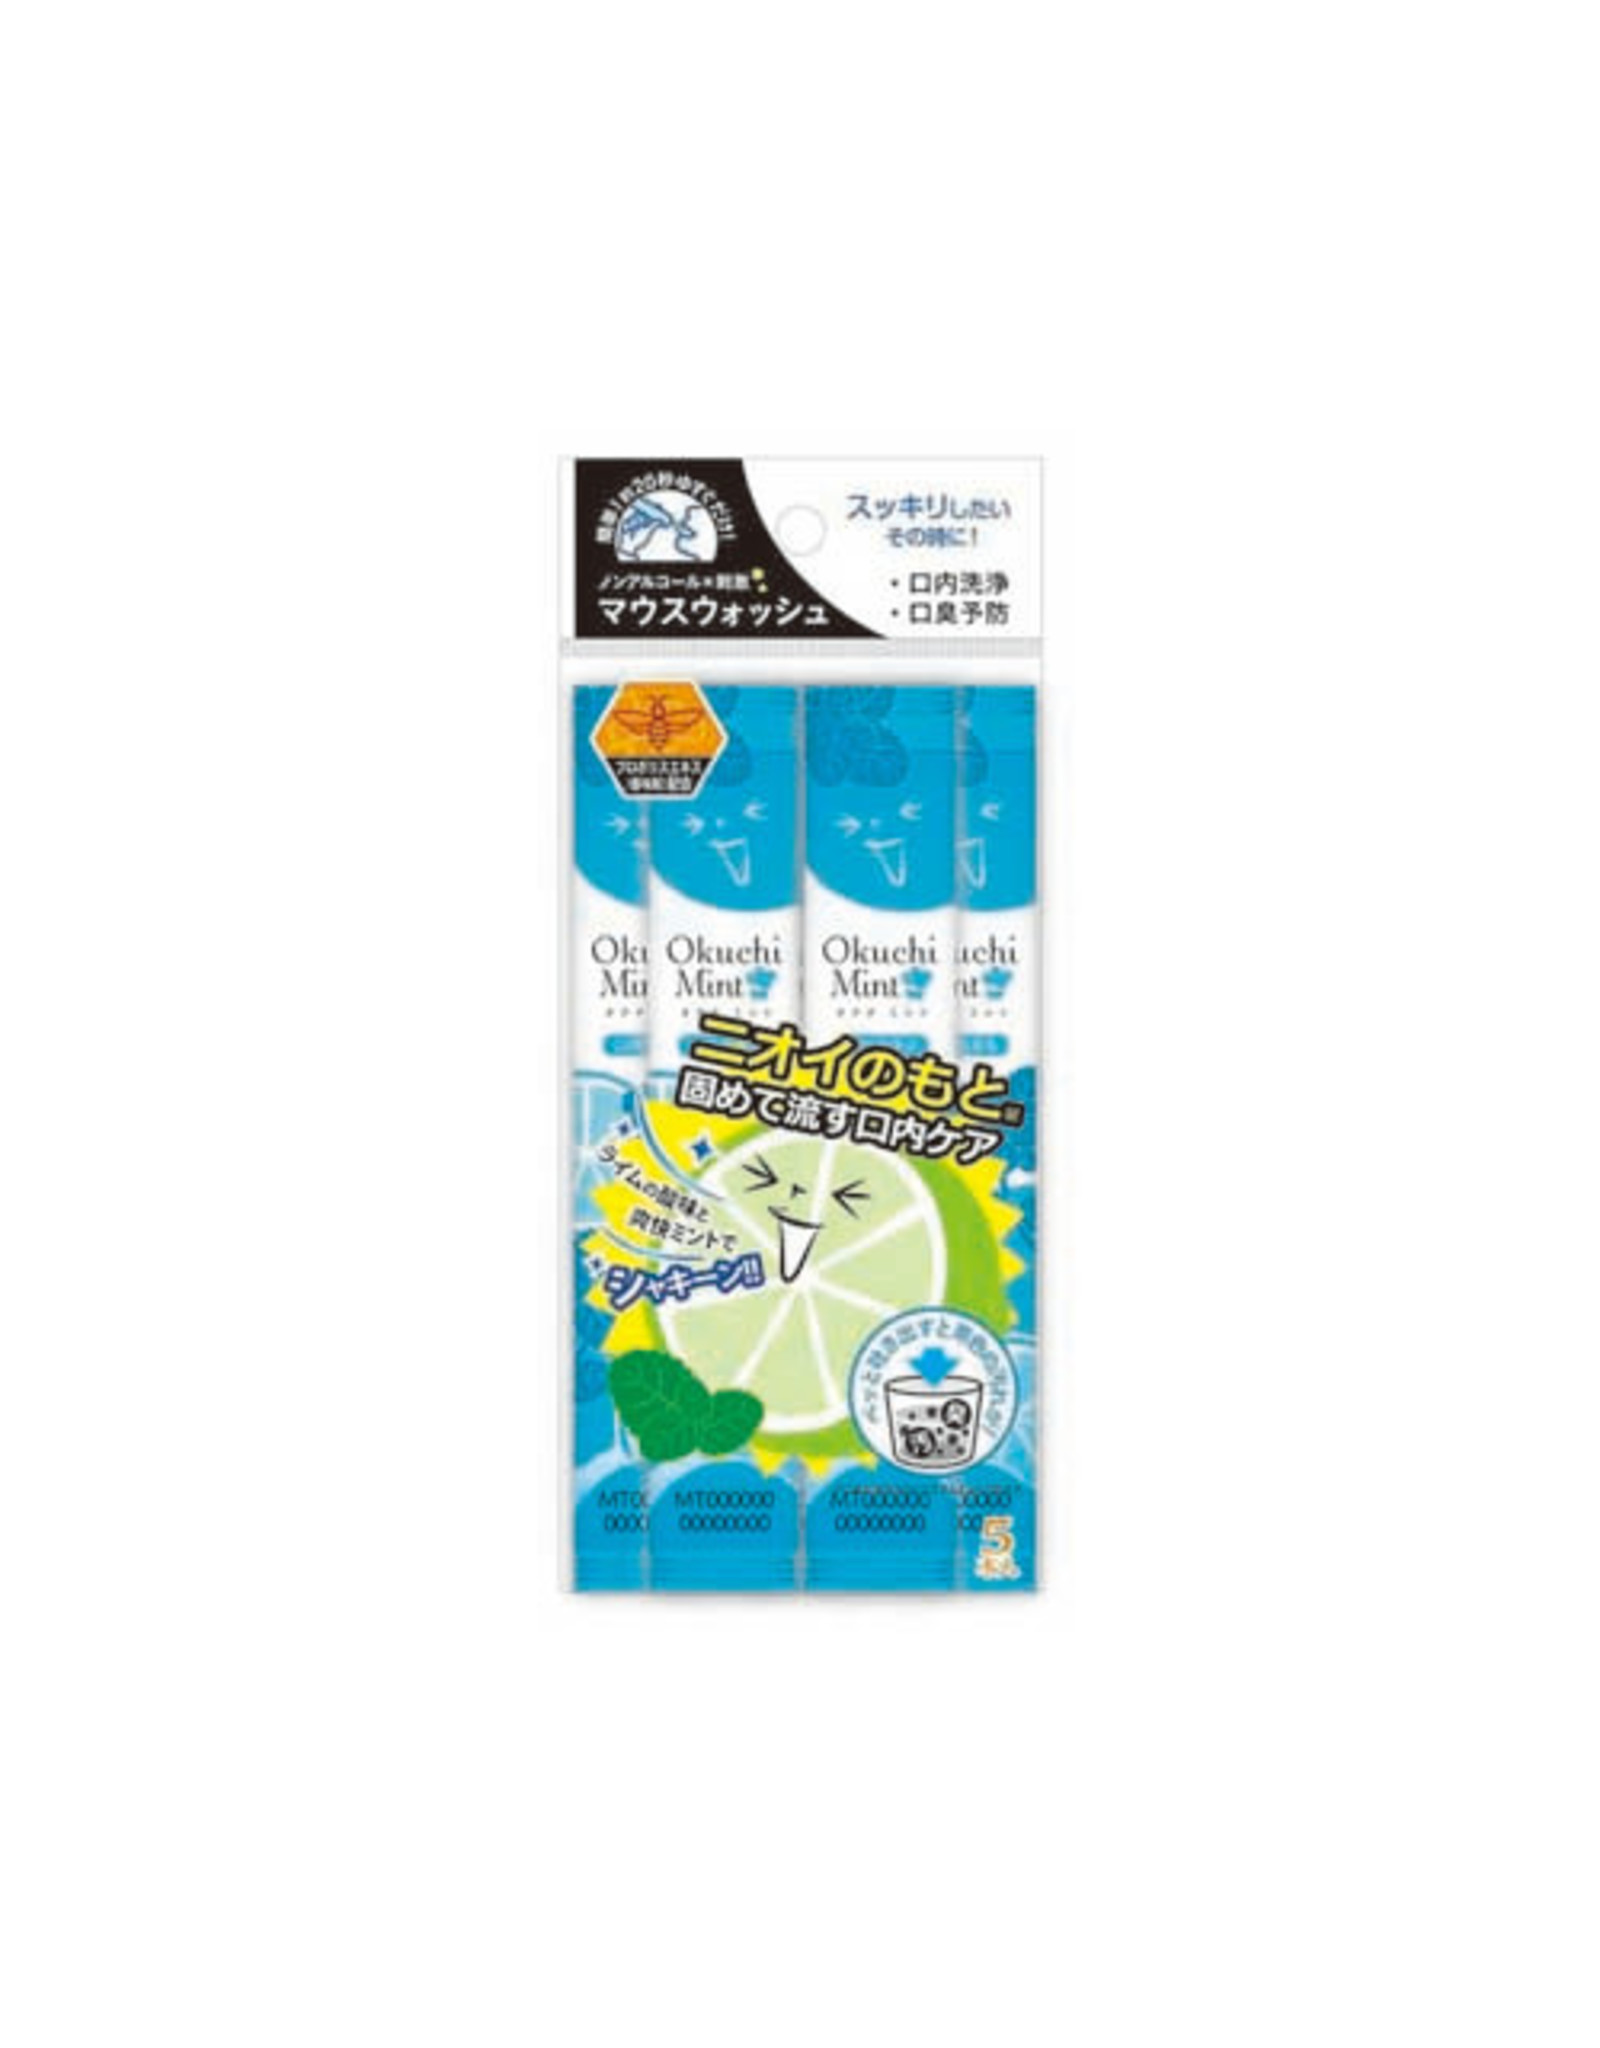 Okuchi Mint Mouth Wash 5Pcs